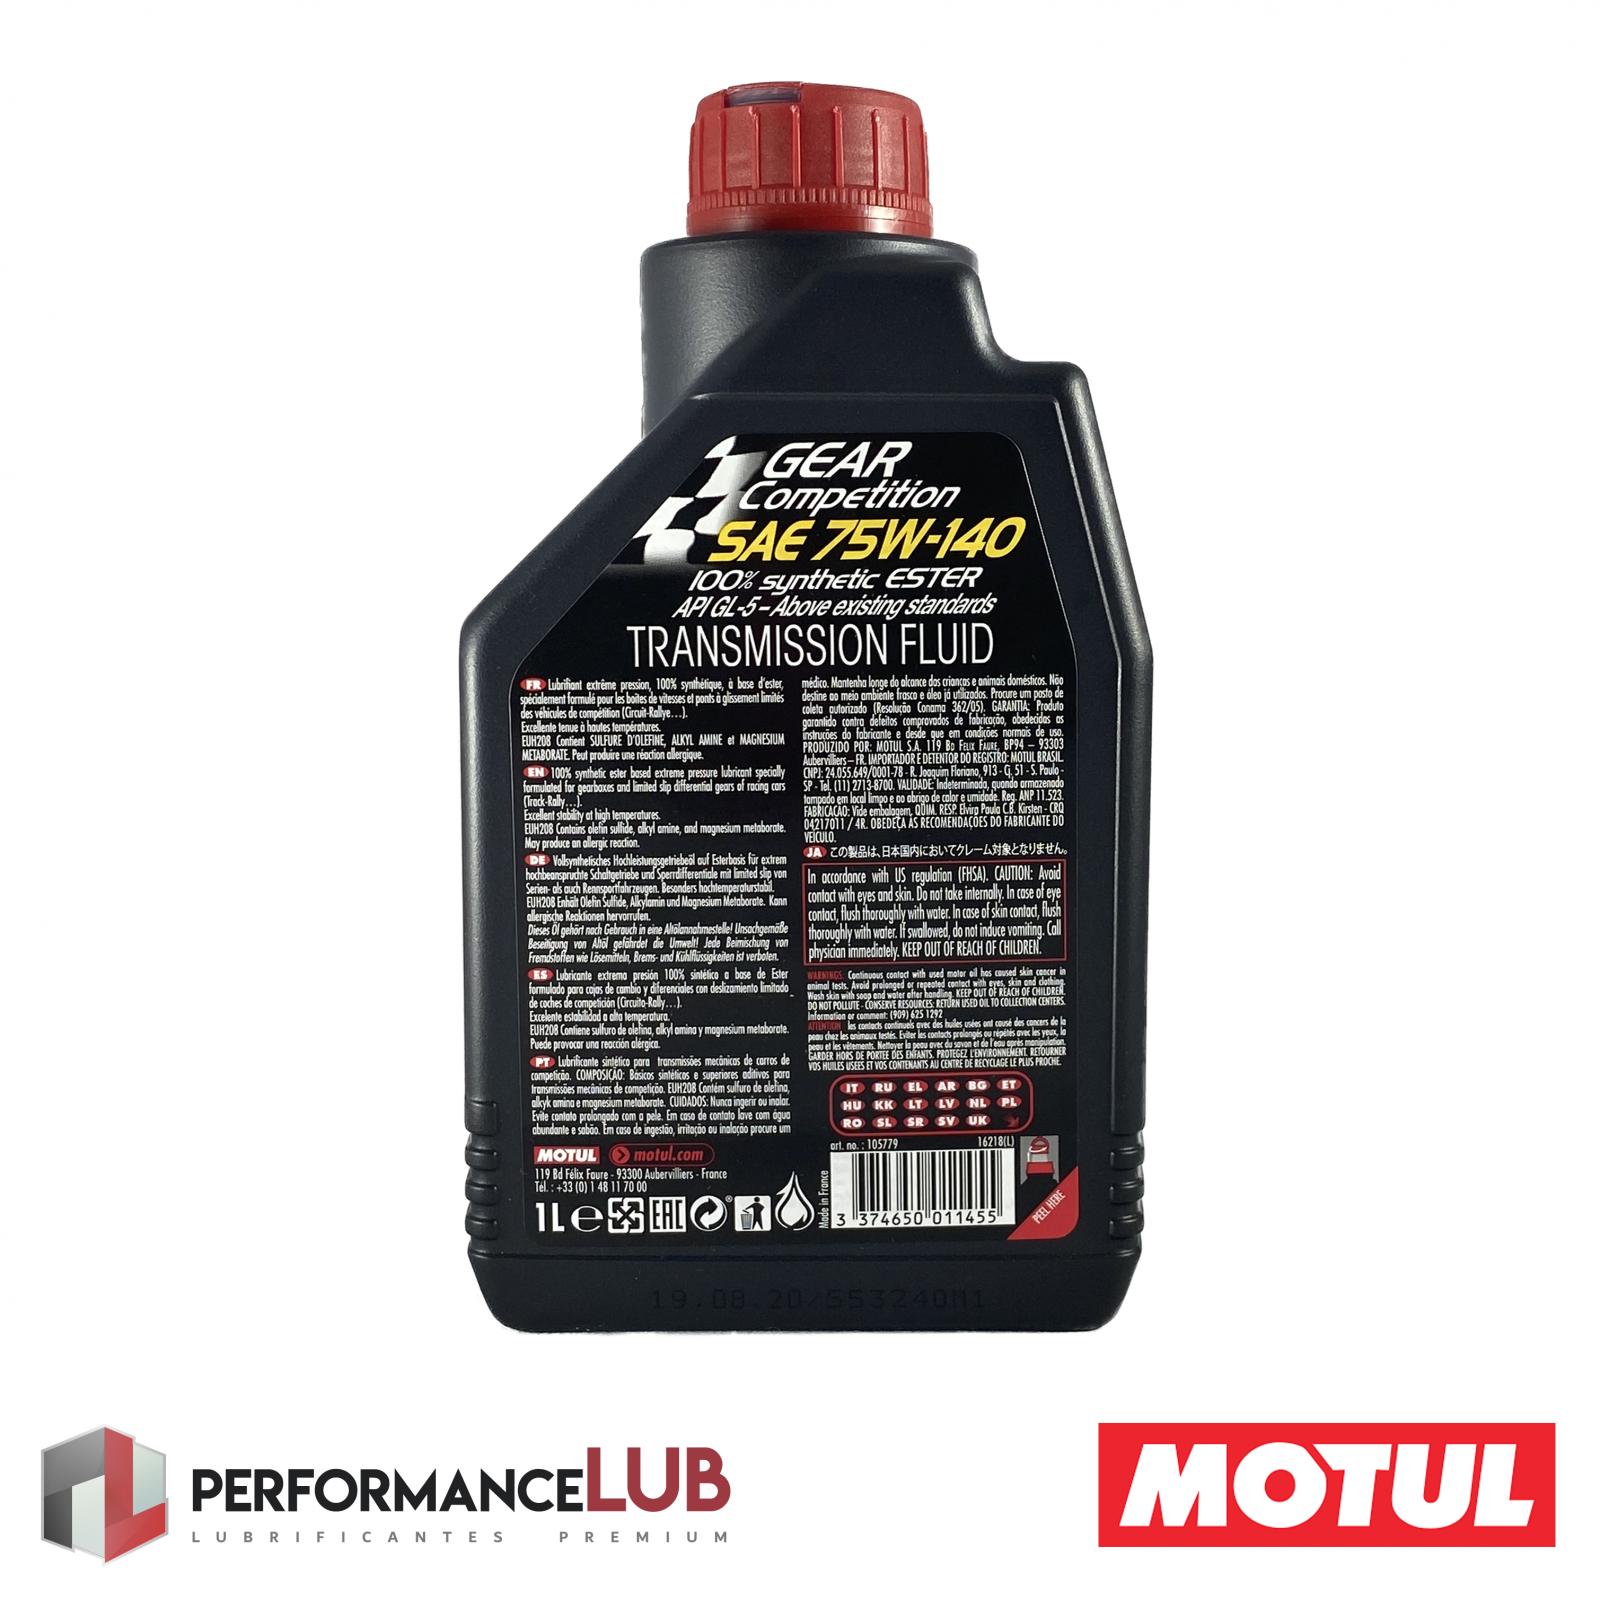 Gear Competition 75W140 - API GL-5 - 1 litro - PerformanceLUB Lubrificantes Premium